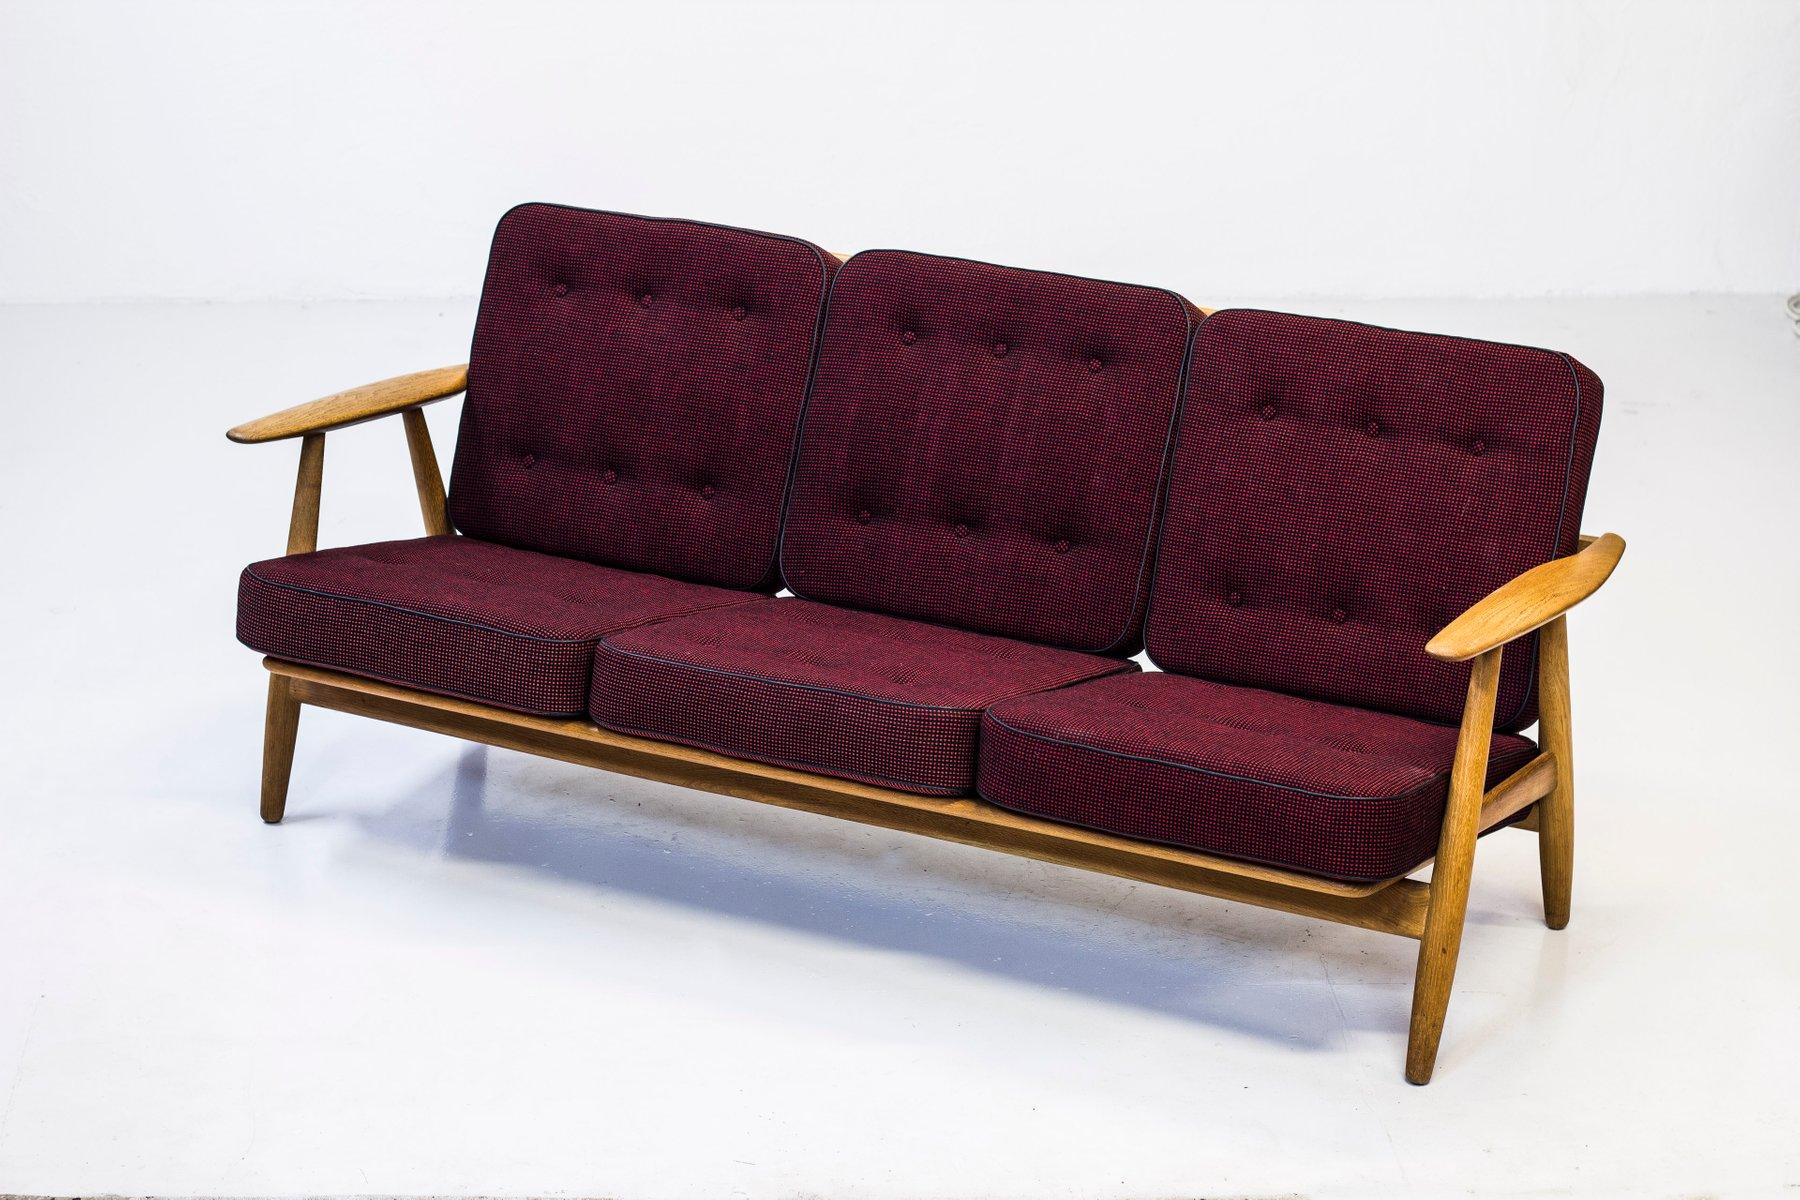 Ge 240 3 Cigar Sofa By Hans J Wegner For Getama 1950s